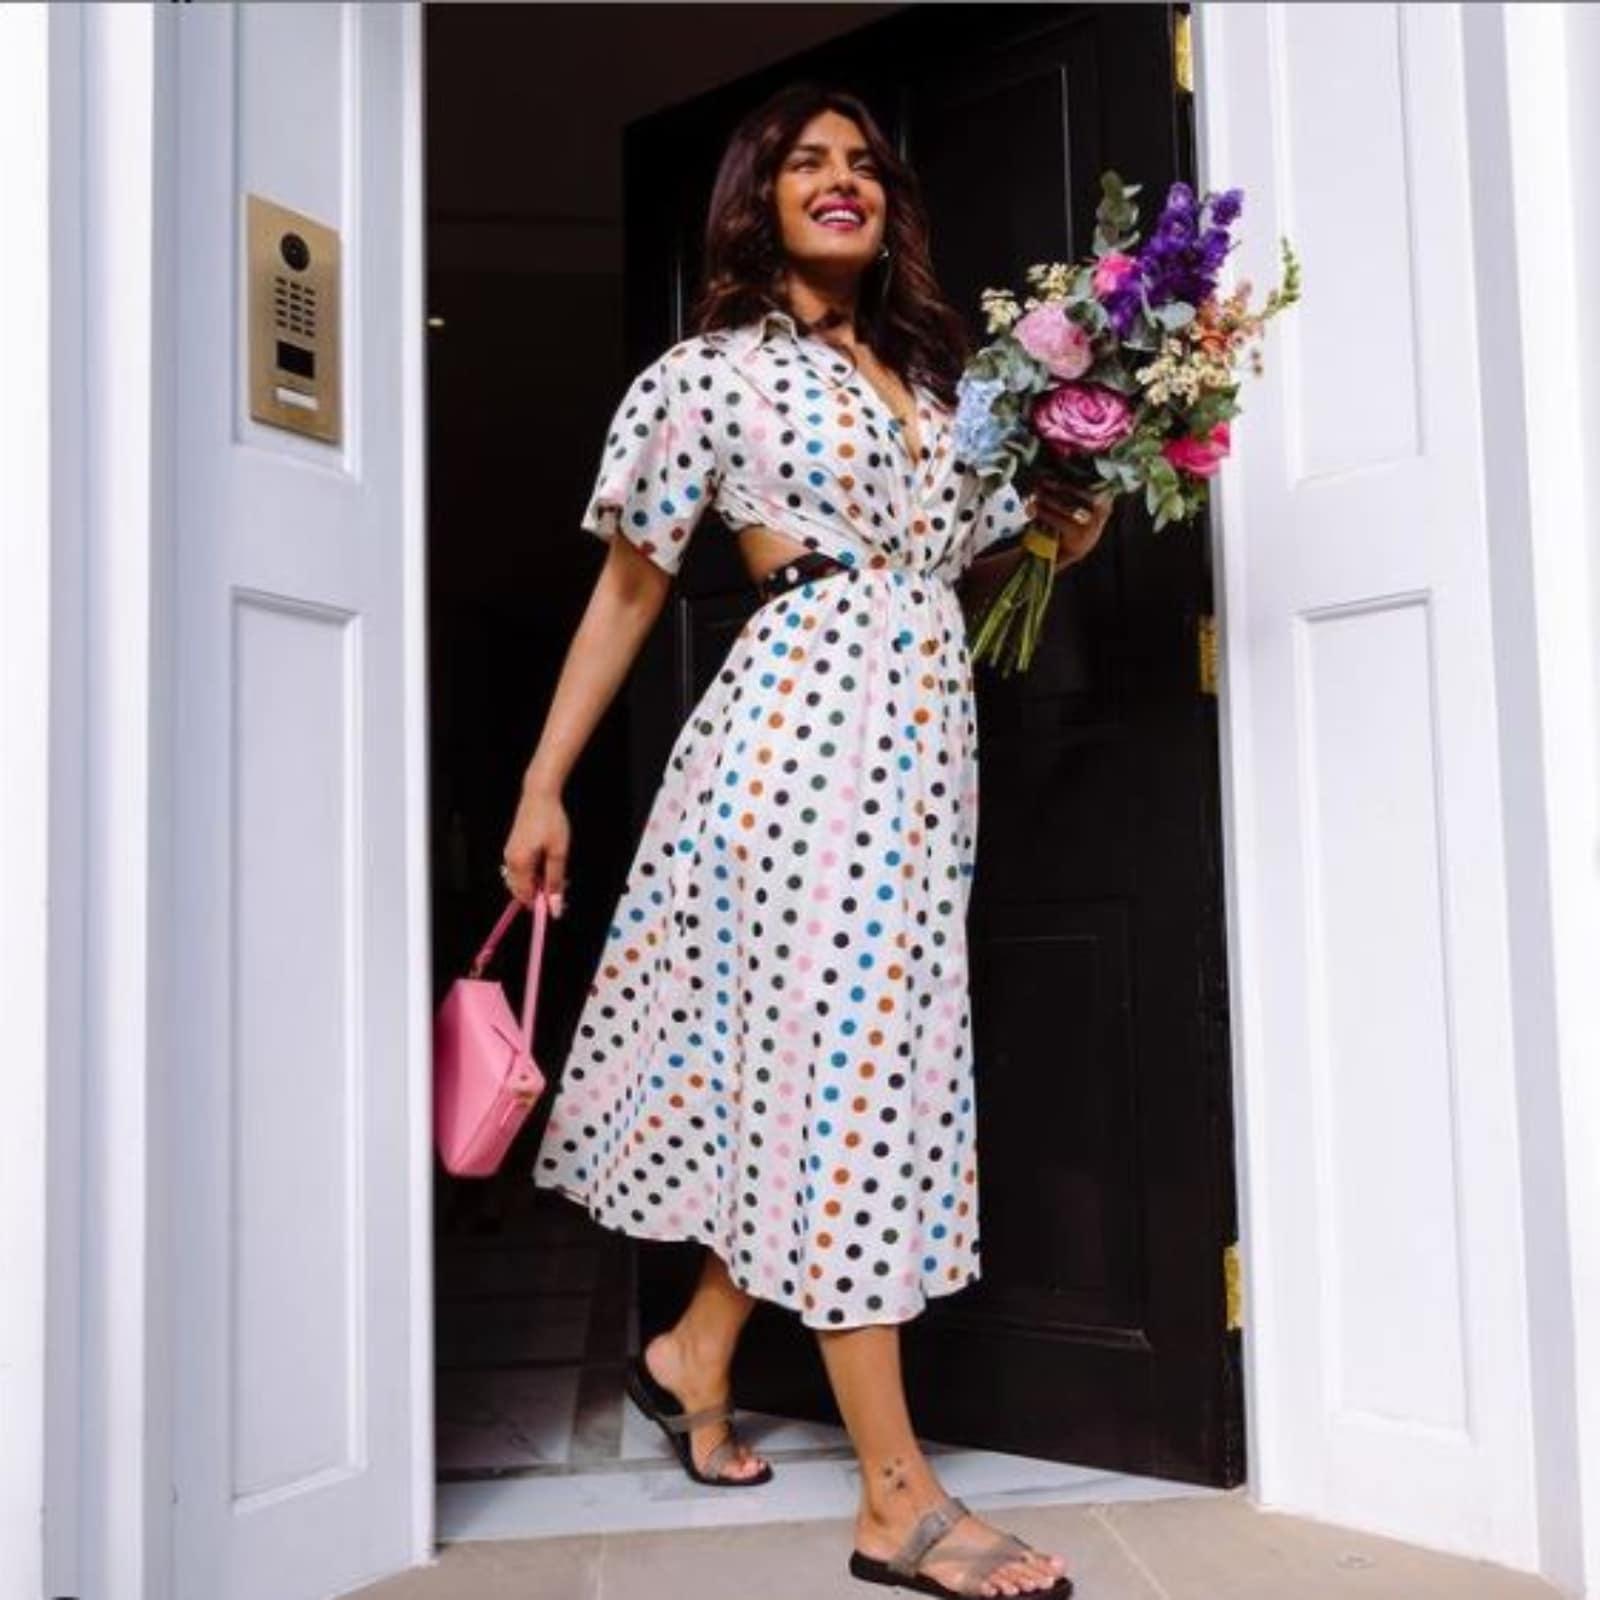 Priyanka Chopra Steps 'Into a Better Future' With Polka Dot Dress, See  Photos